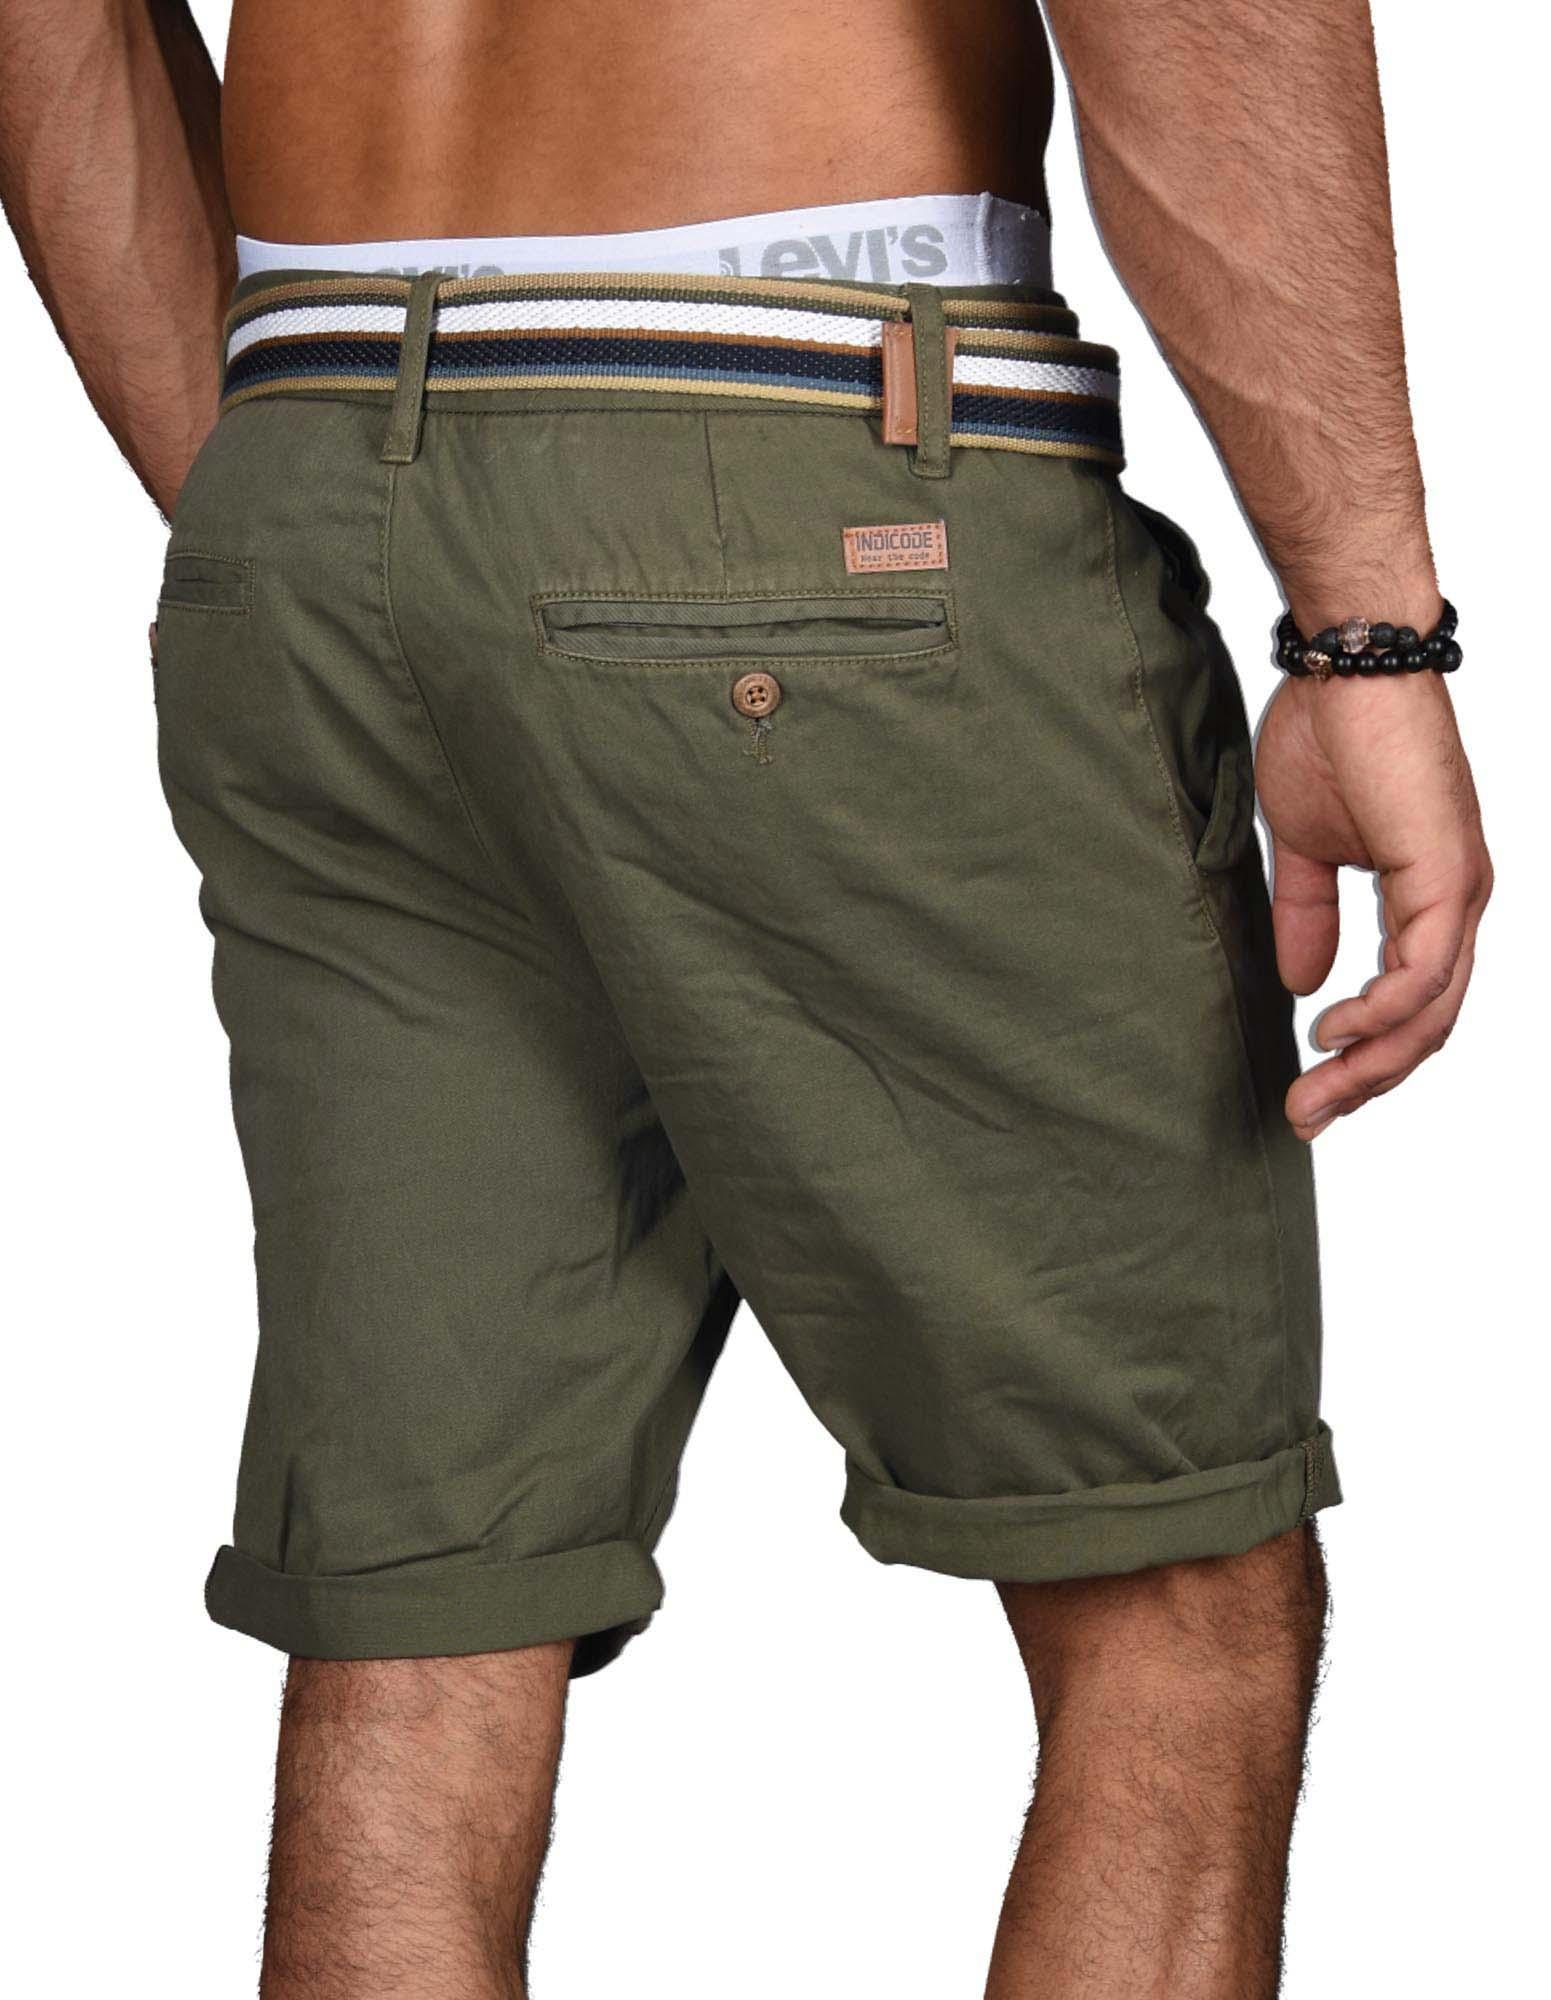 Indicode-Herren-Sommer-Bermuda-Chino-Shorts-kurze-Hose-Sommerhose-Short-NEU-B499 Indexbild 20